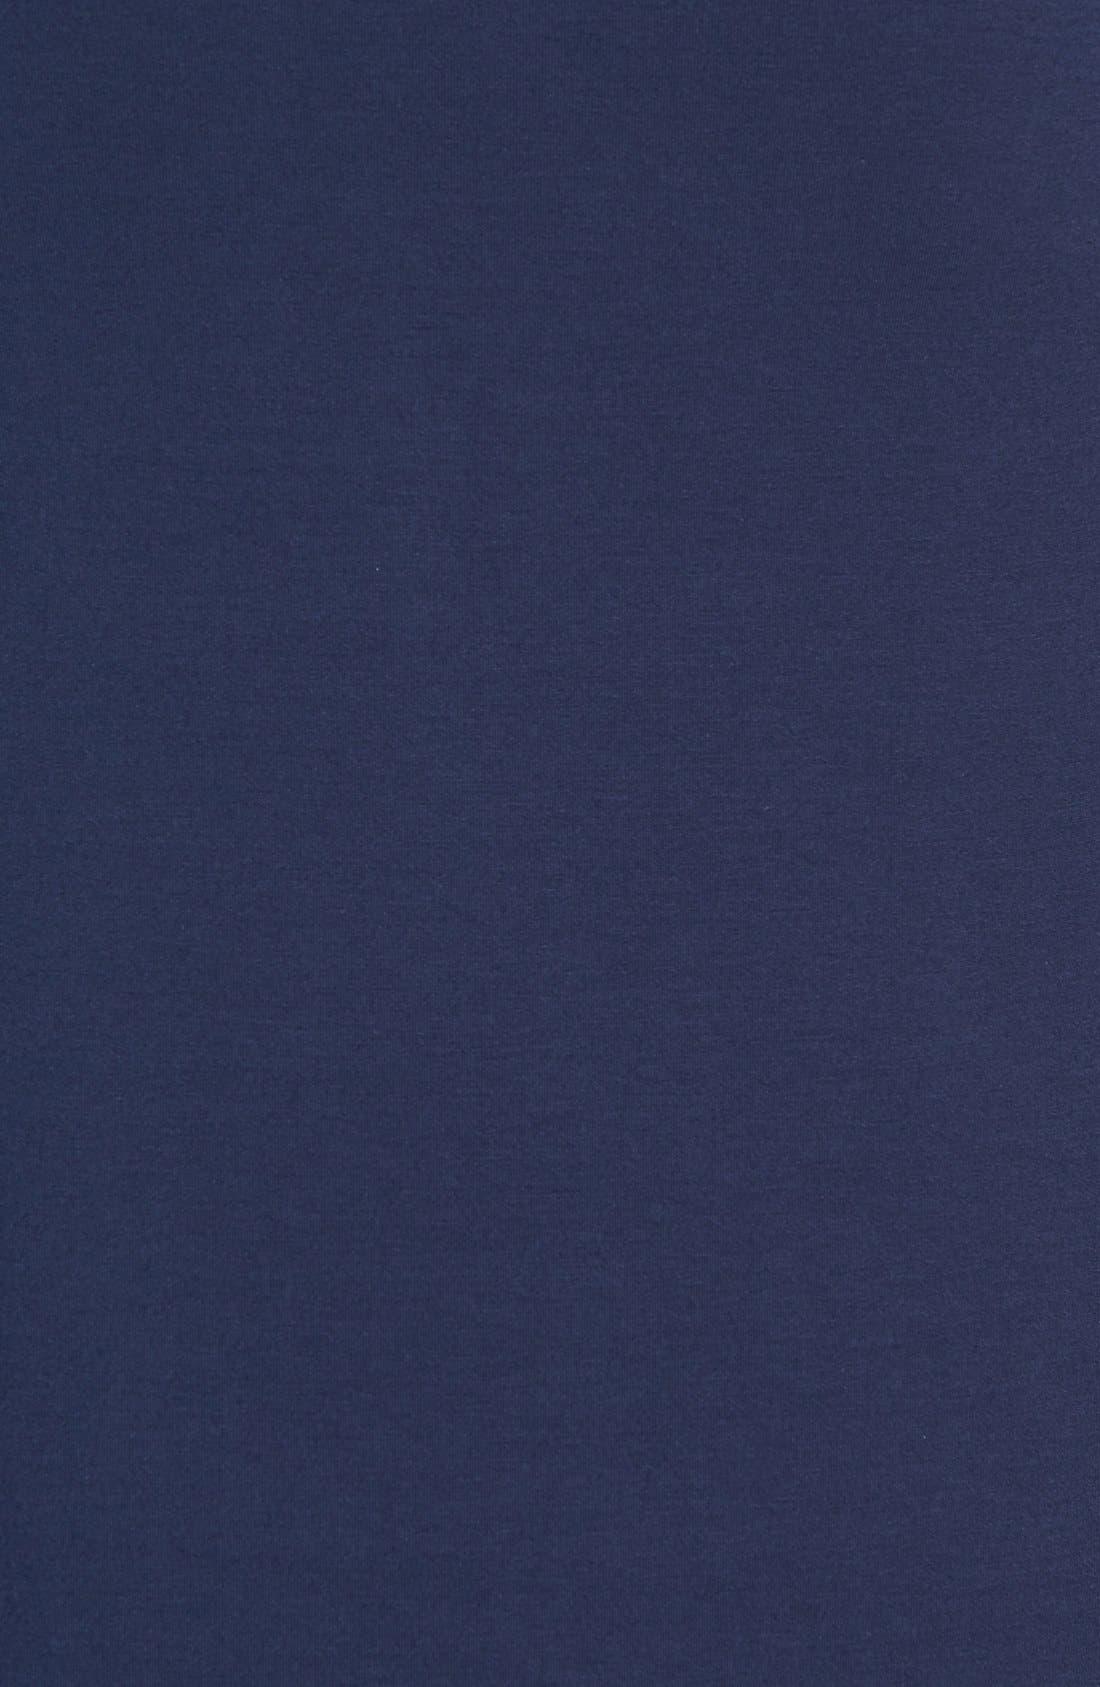 Convertible Maxi Skirt,                             Alternate thumbnail 33, color,